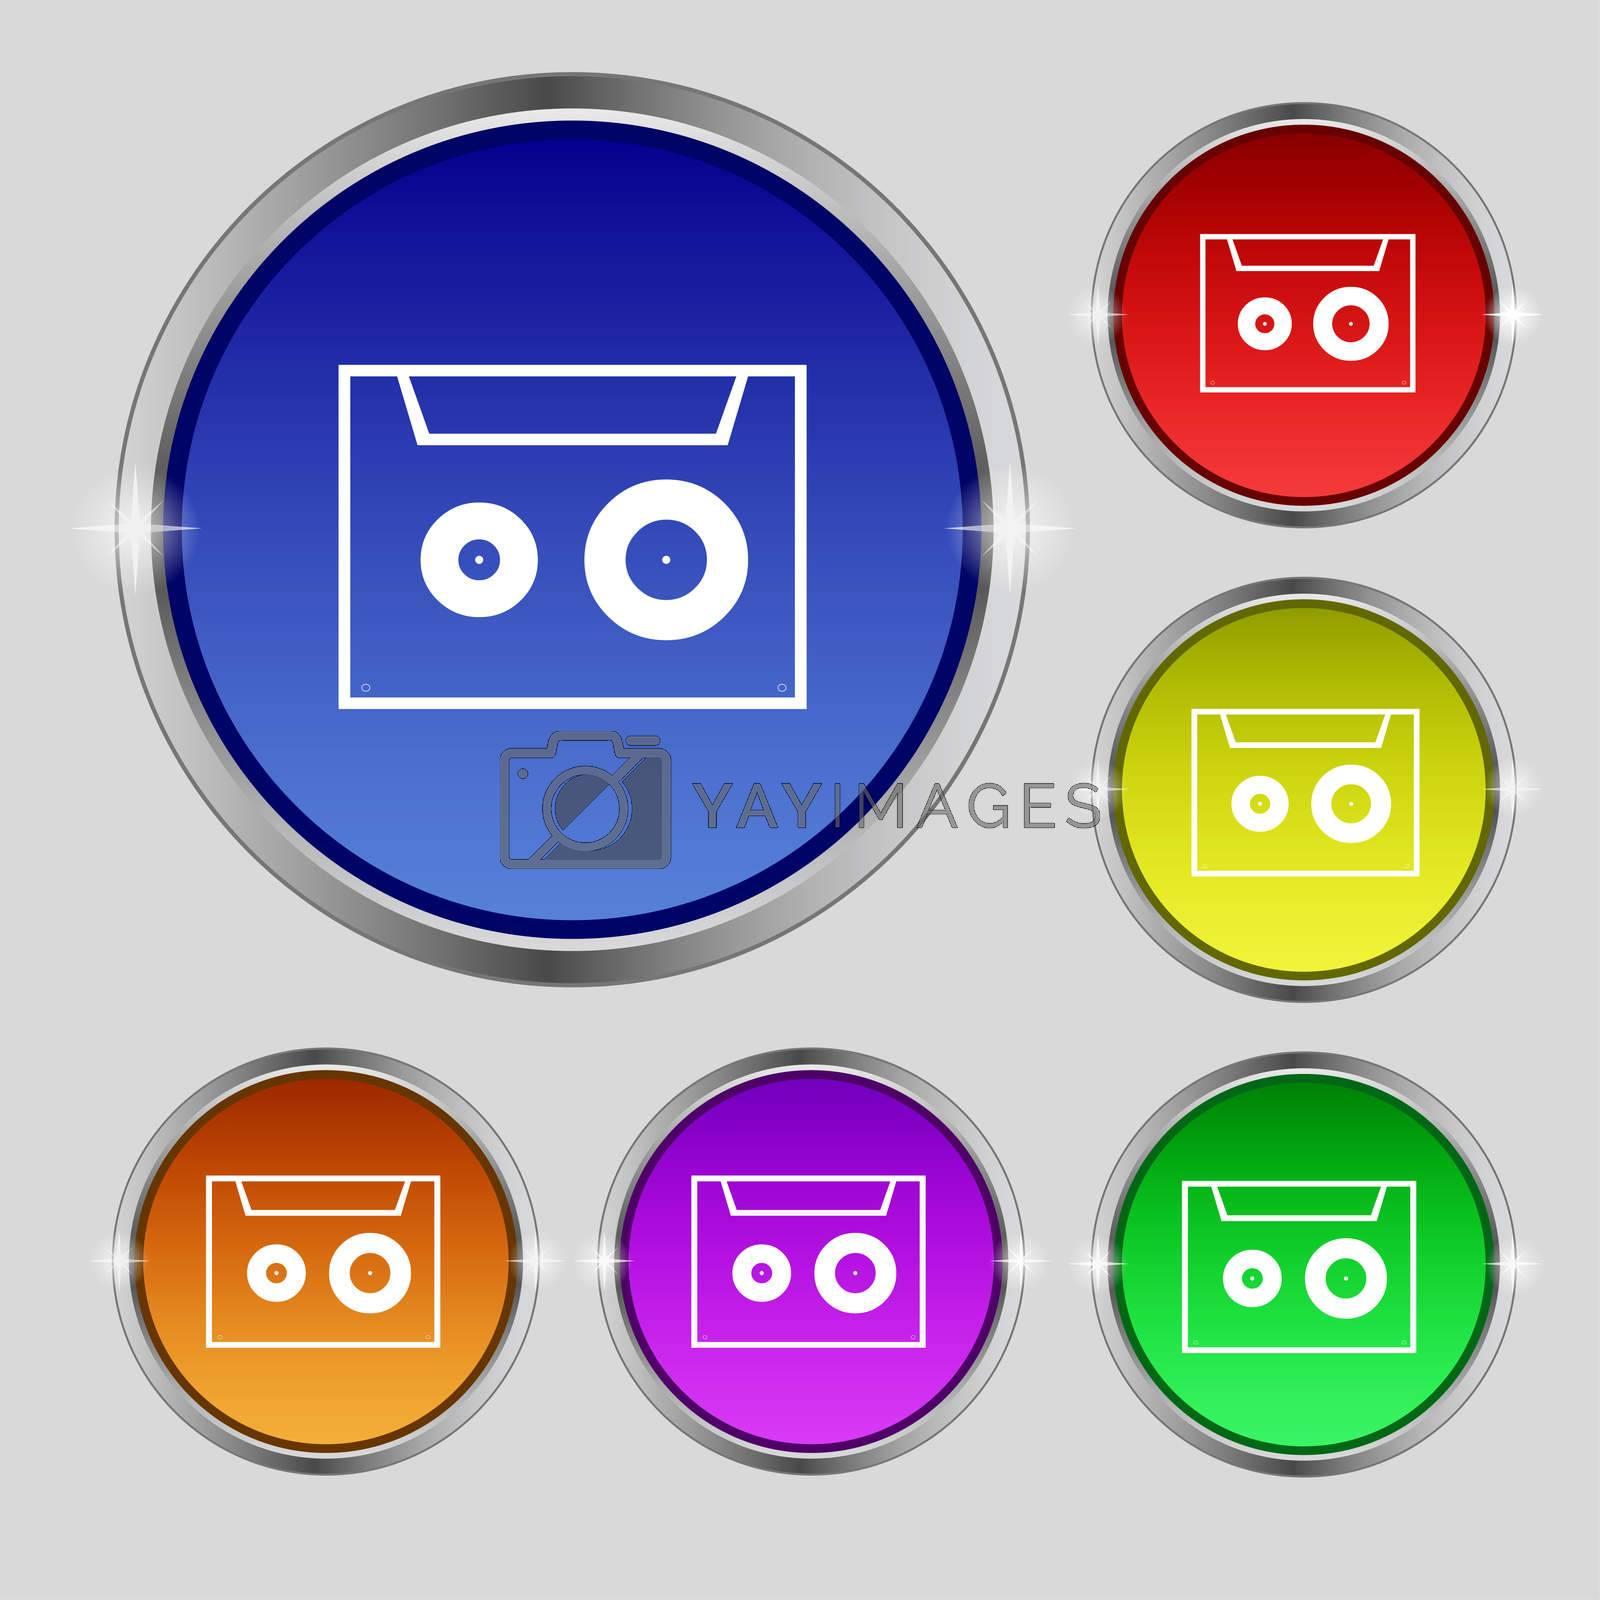 cassette sign icon. Audiocassette symbol. Set of colour buttons.  by Serhii Lohvyniuk